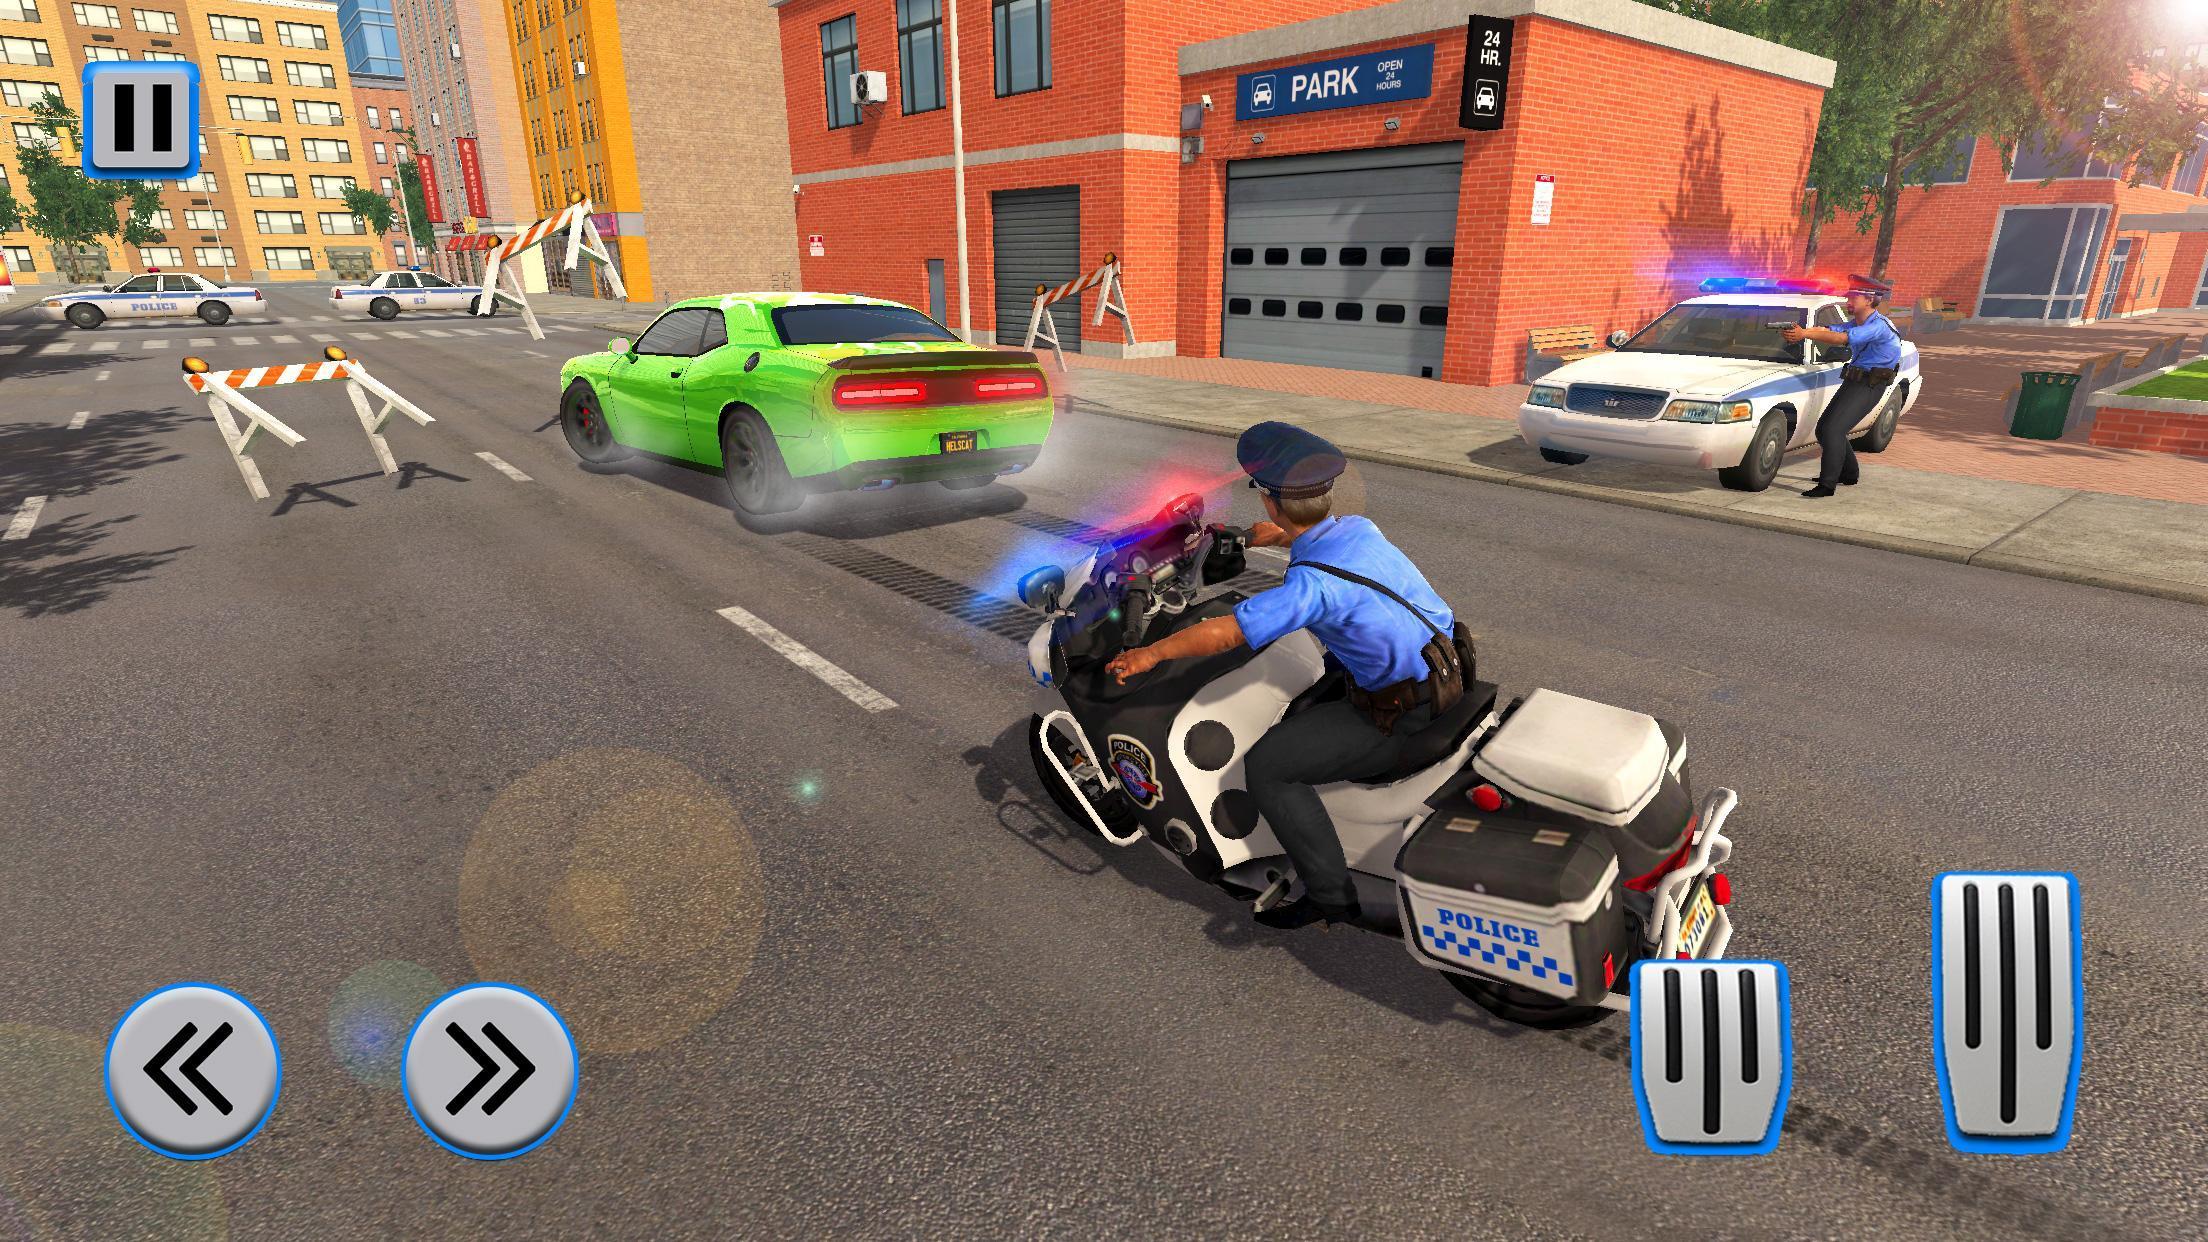 Police Moto Bike Chase – Free Shooting Games 2.0.3 Screenshot 6